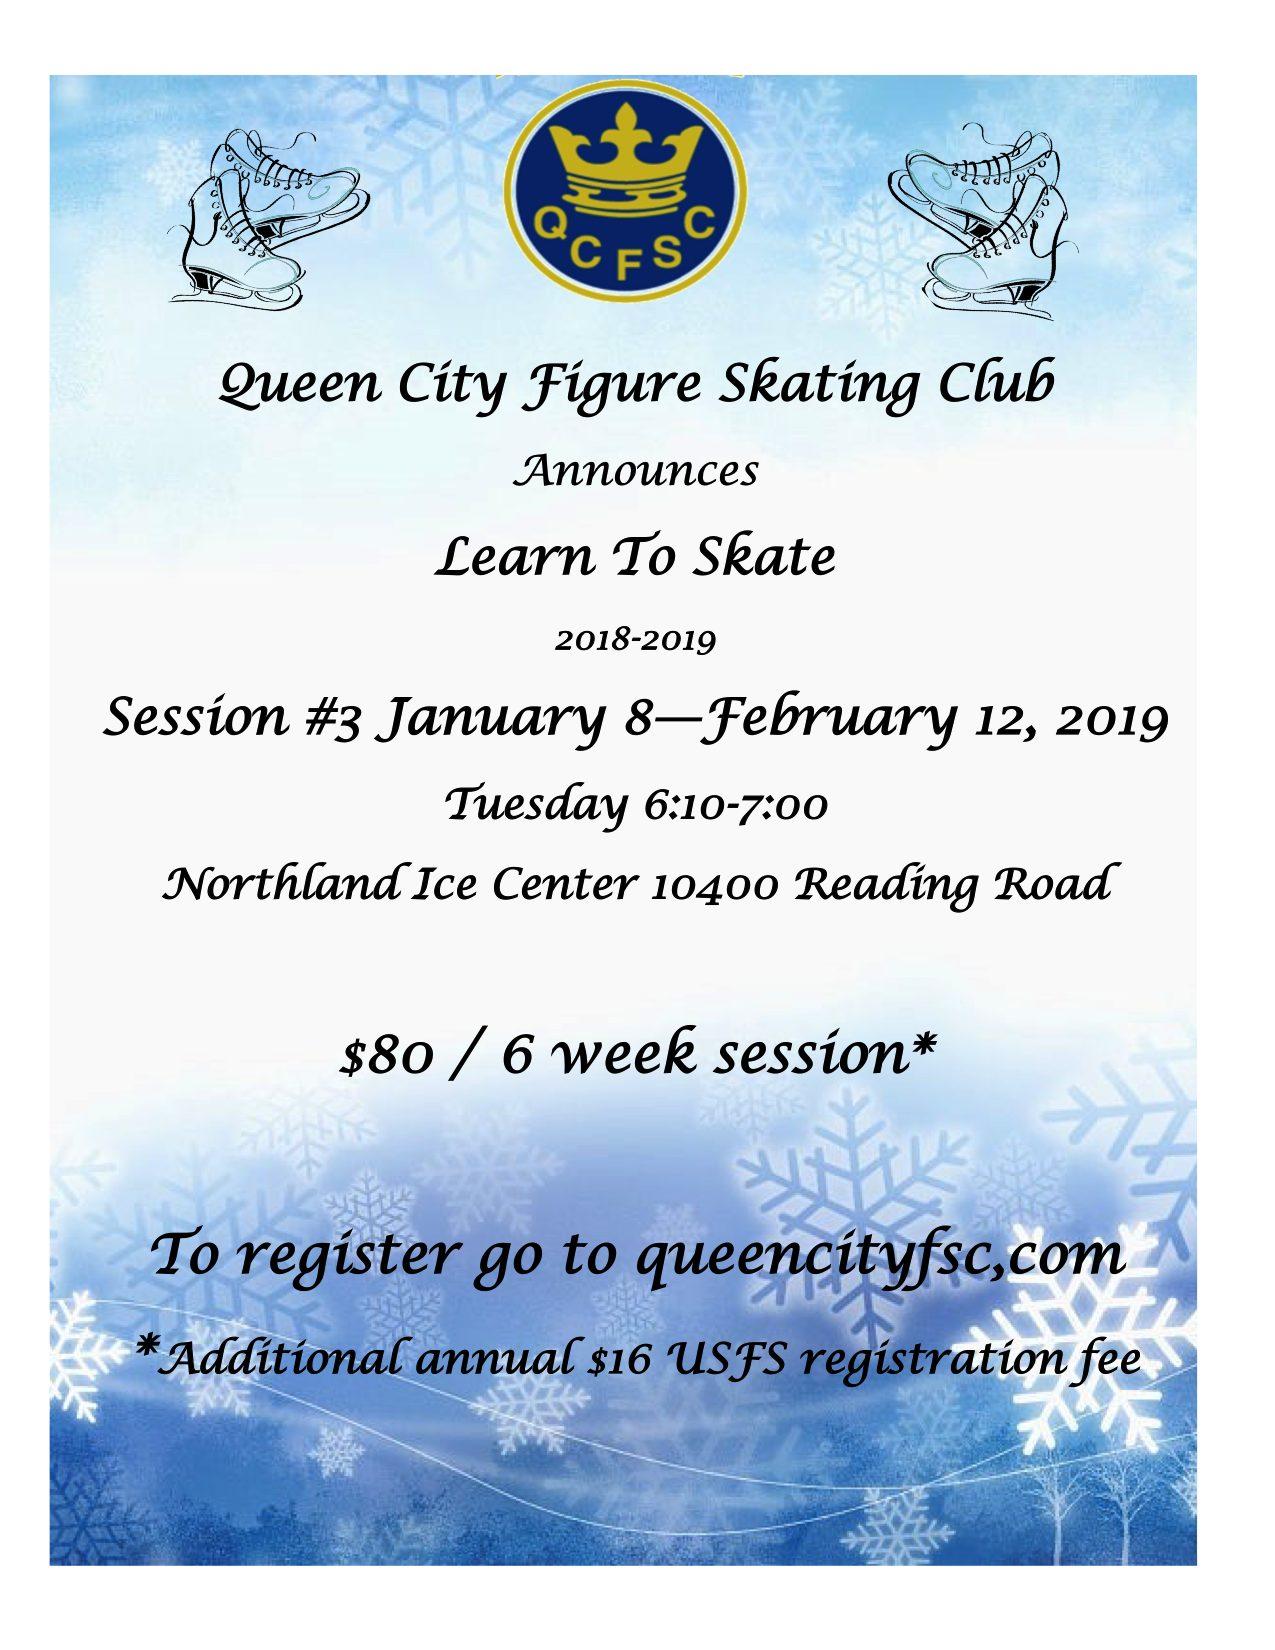 QCFSC LTS Session #3-2018 2019